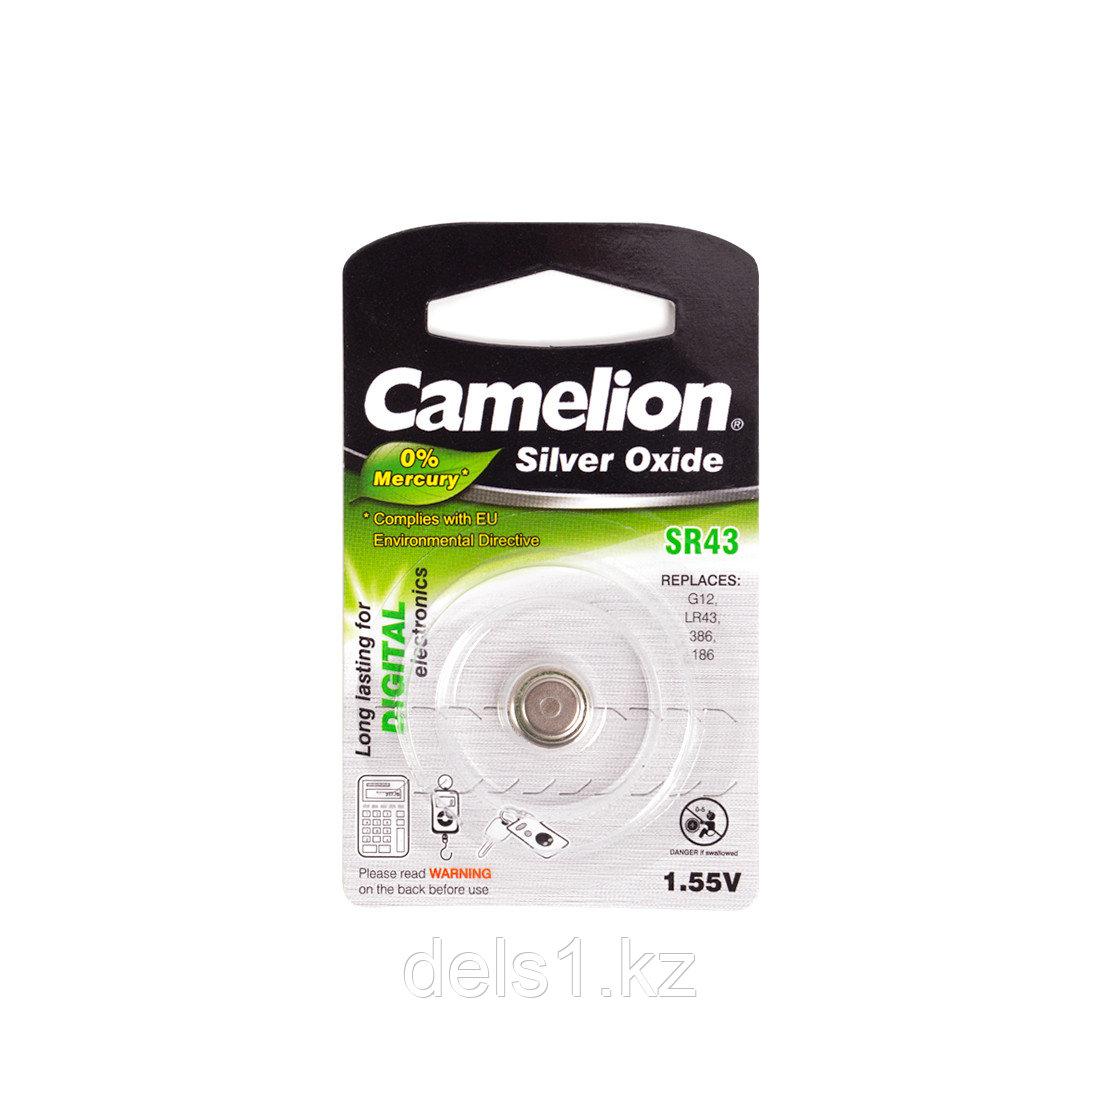 Батарейка, CAMELION, SR43-BP1(0%Hg) , Silver Oxide, 1.55V, 0% Ртути, 1 шт., Блистер